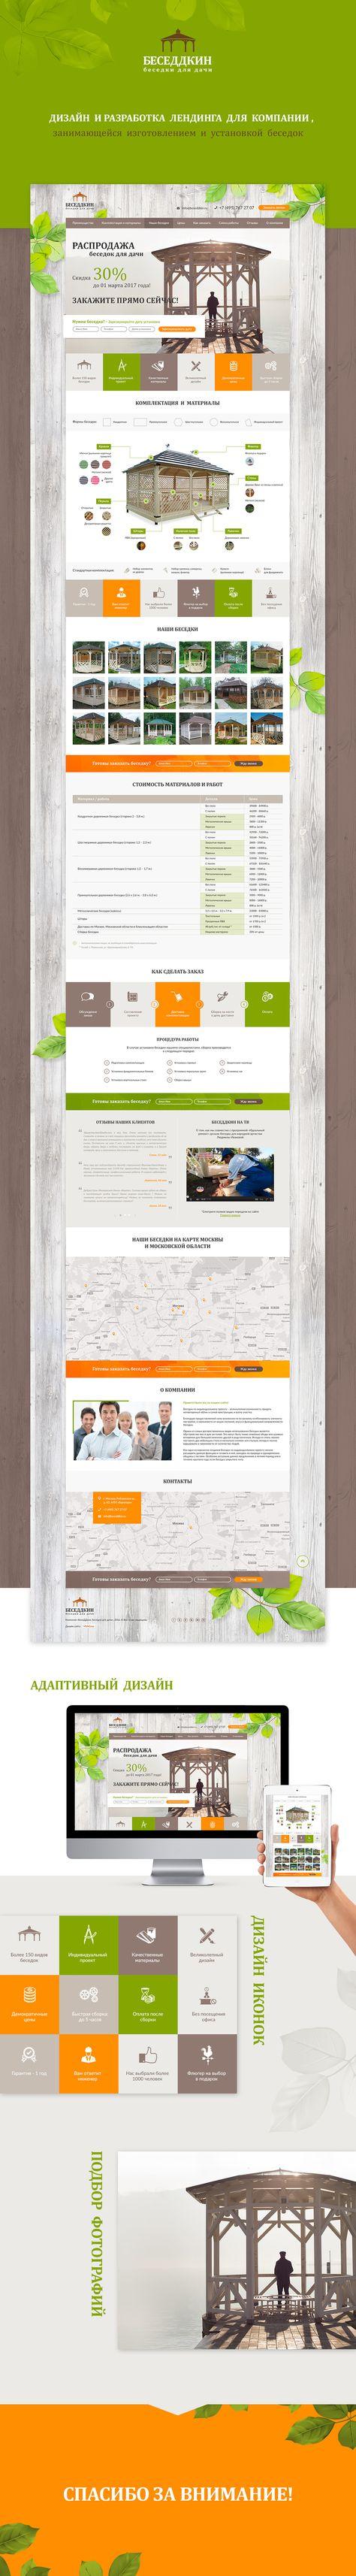 Design of Landing Page for Beseddkin